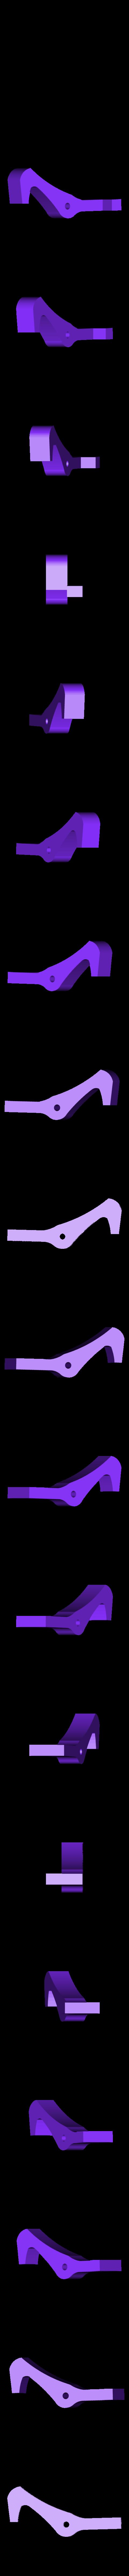 22_FCC_Crochet.stl Download free STL file Ymir - Airsoft Shotgun/grenade launcher • 3D print design, Snorri